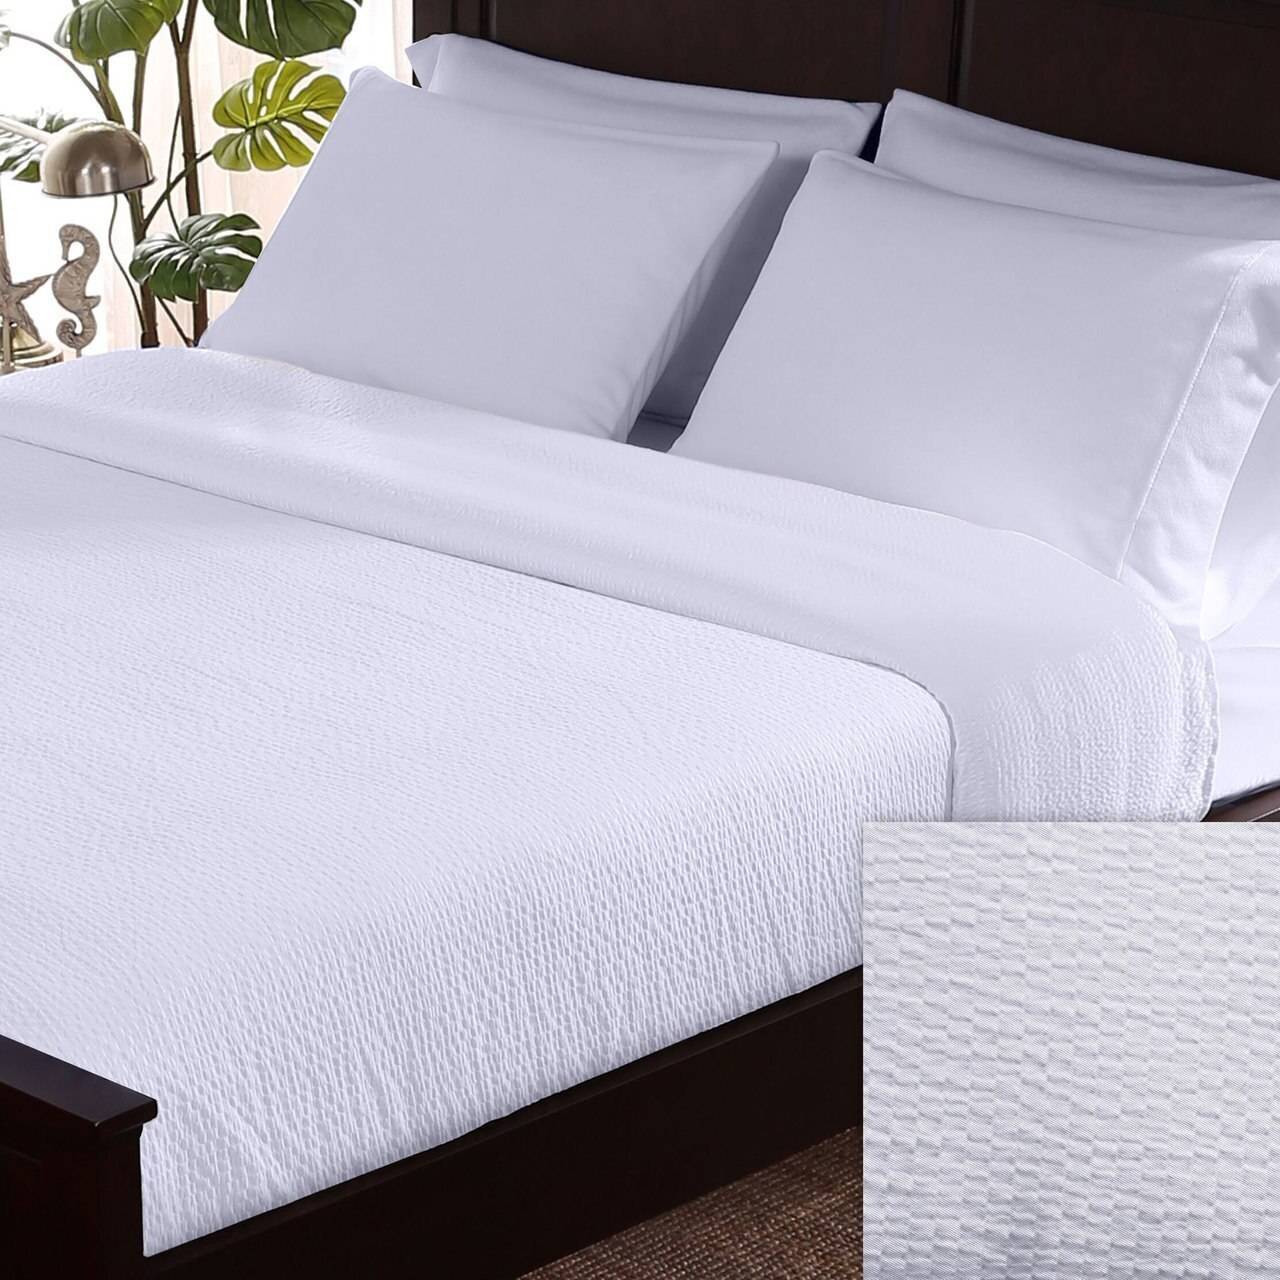 Berkshire Blankets BERKSHIRE or CLASSIC SEERSUCKER or 185 GSM or TOP SHEET